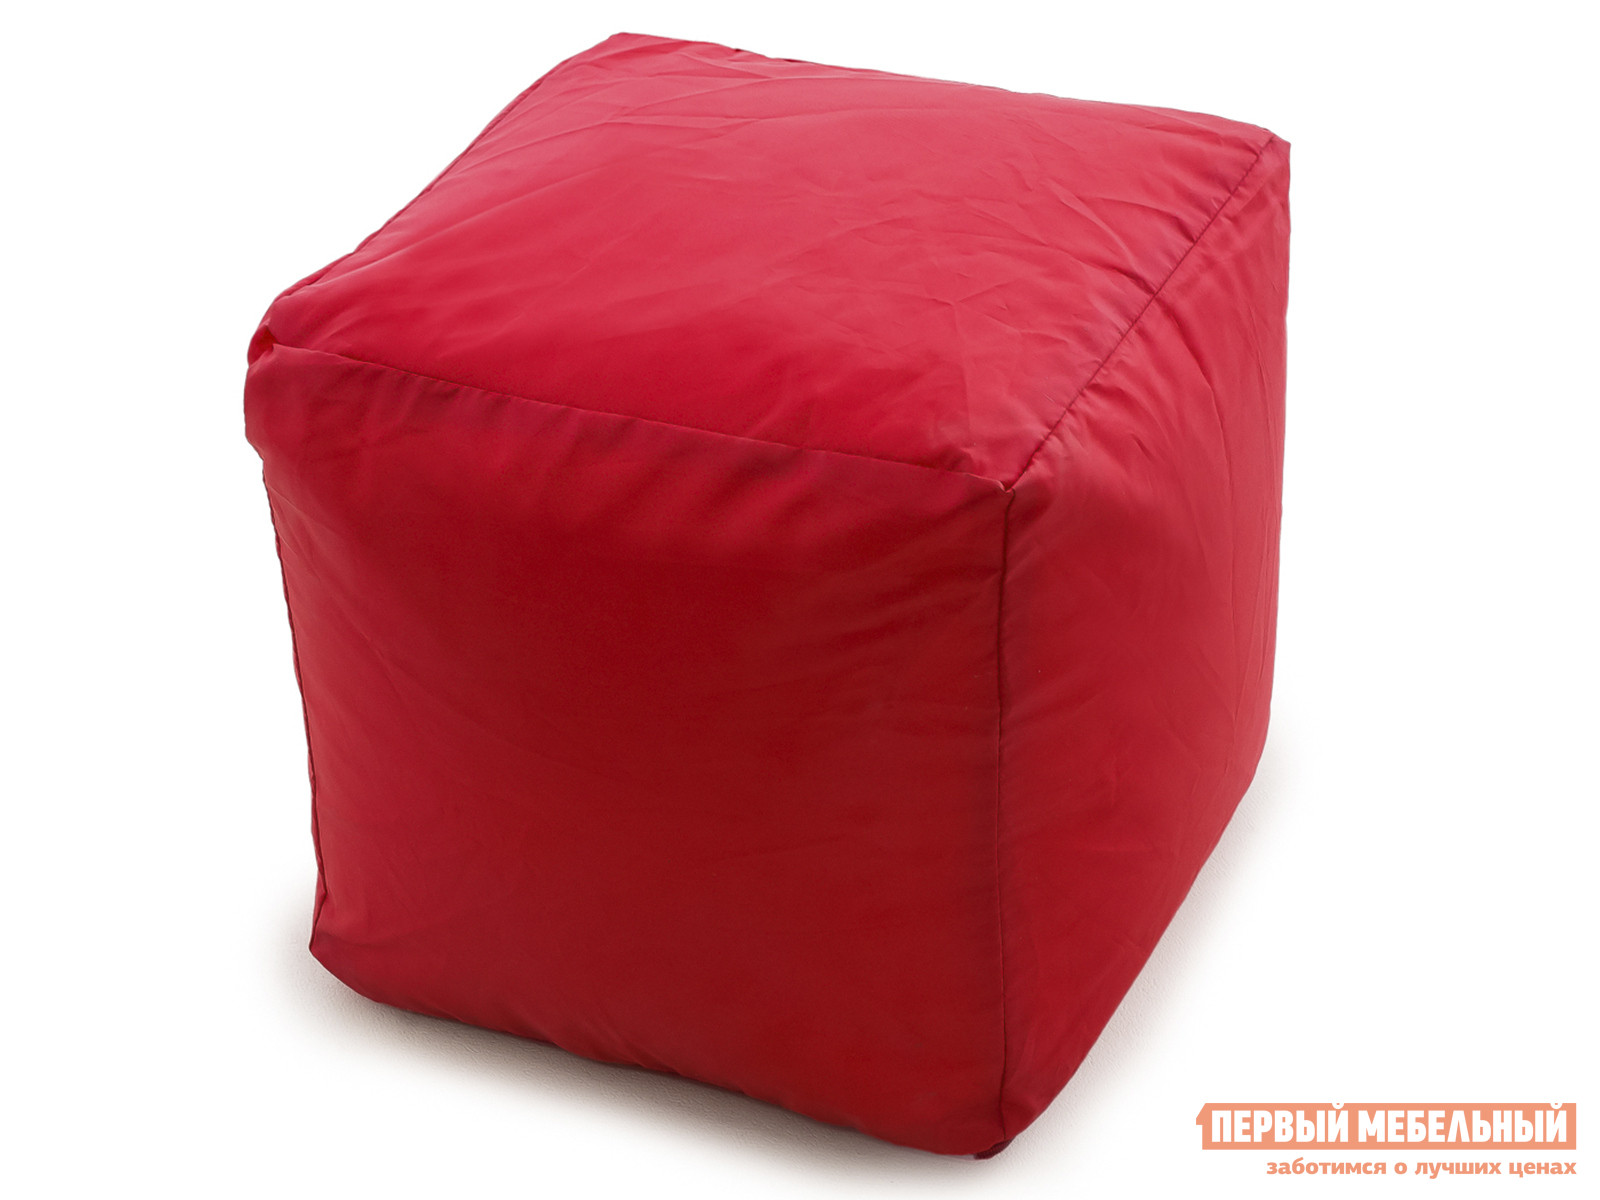 Пуфик  Кубик Красный